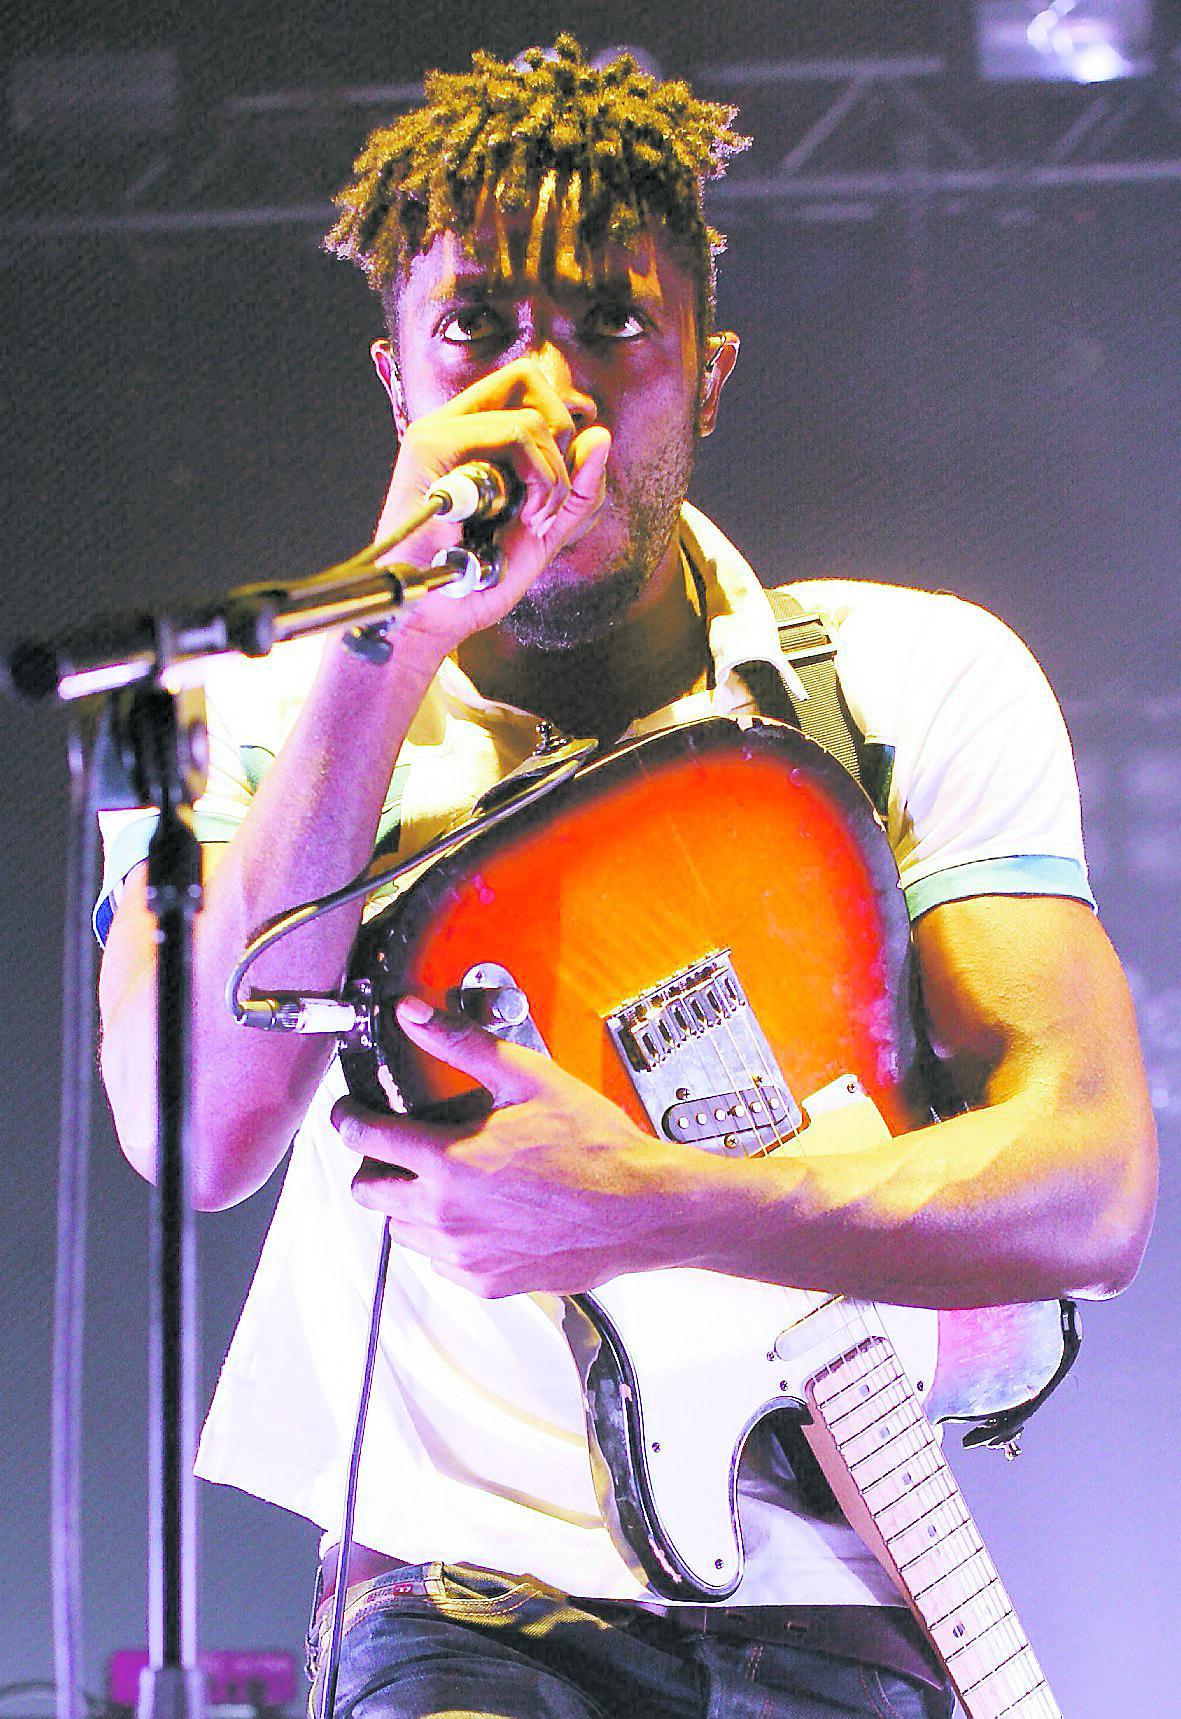 Sångaren Kele Okereke får igång publiken på Cirkus.